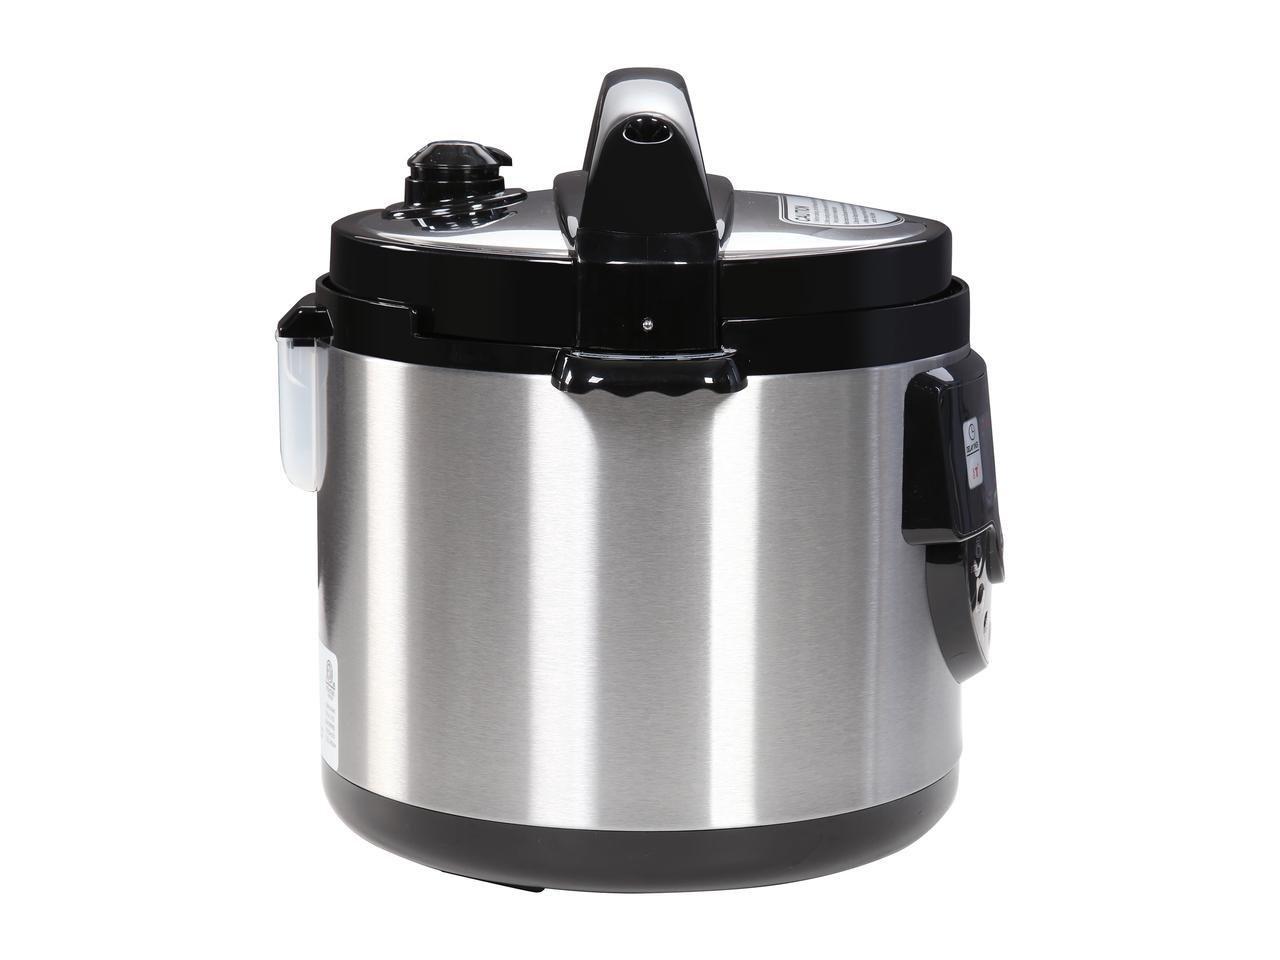 Tayama TMC-60XL 6 quart 8-in-1 Multi-Function Pressure Cooker, Black by TAYAMA (Image #3)